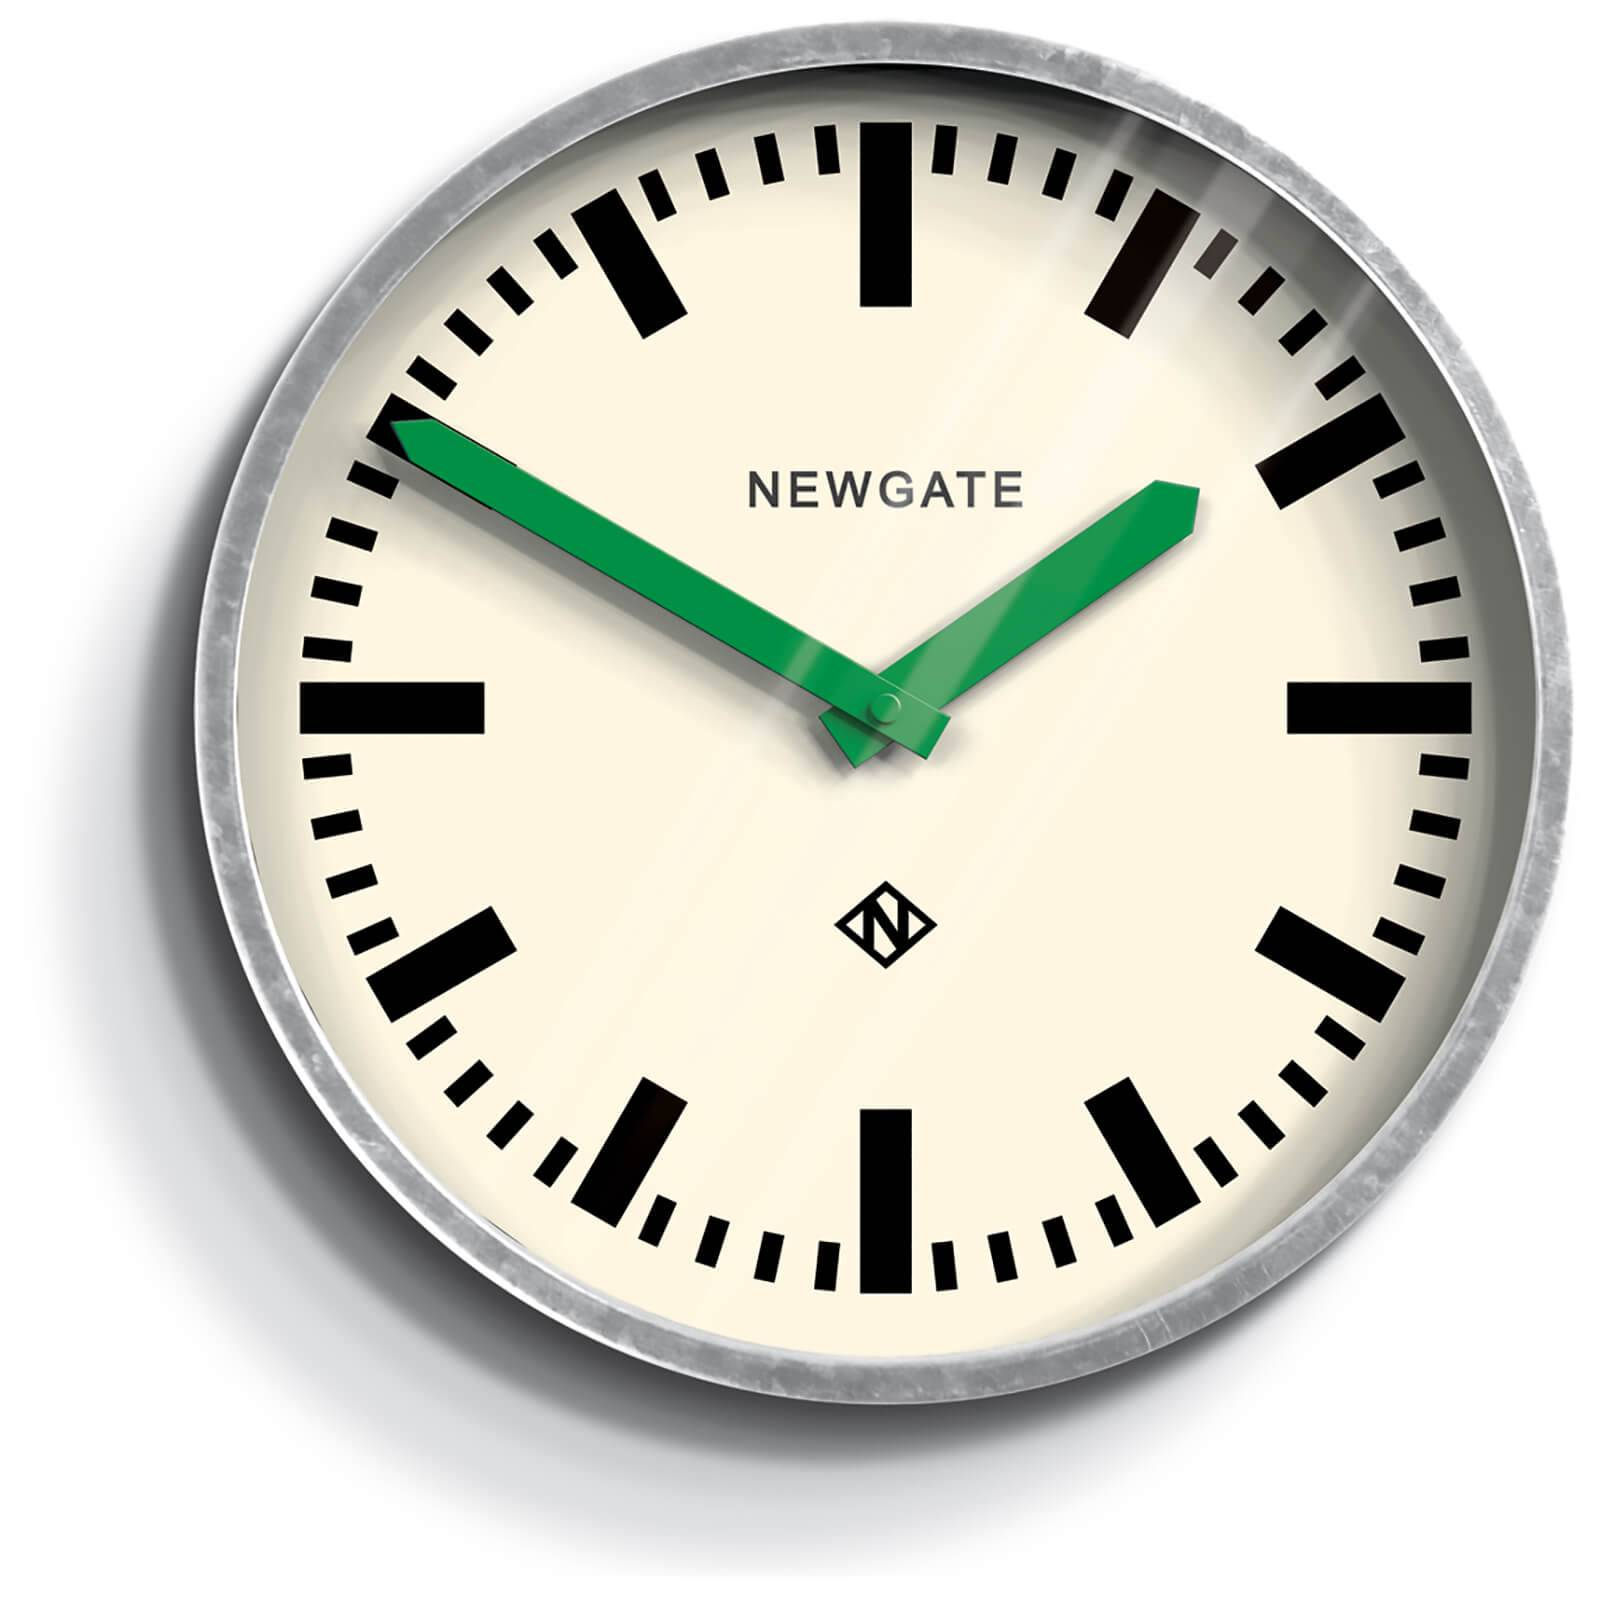 Newgate Luggage Wall Clock - Green Hands